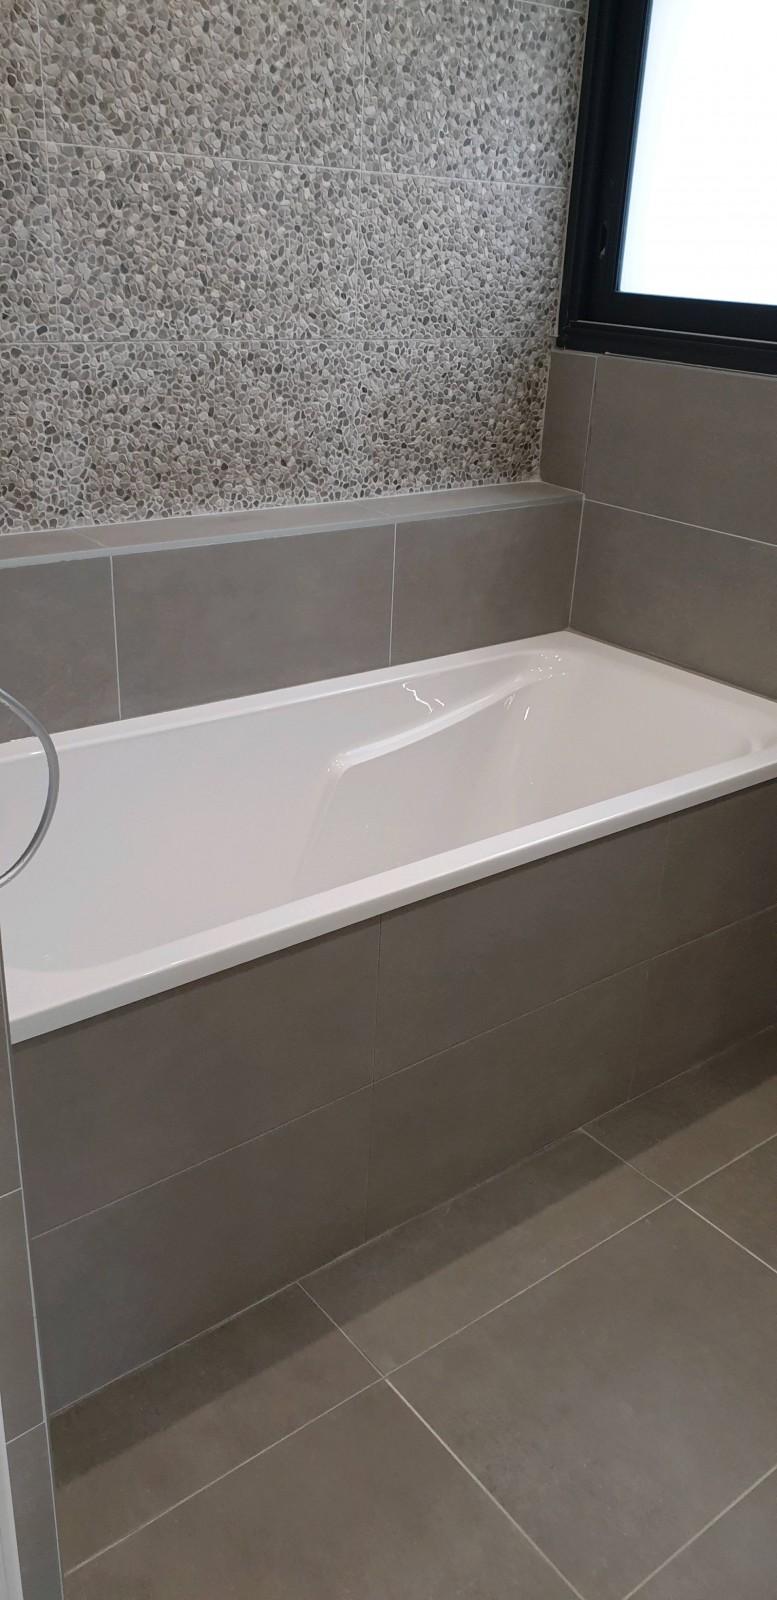 Salle De Bain Avec Baignoire moderniser une salle de bain avec une baignoire et meuble